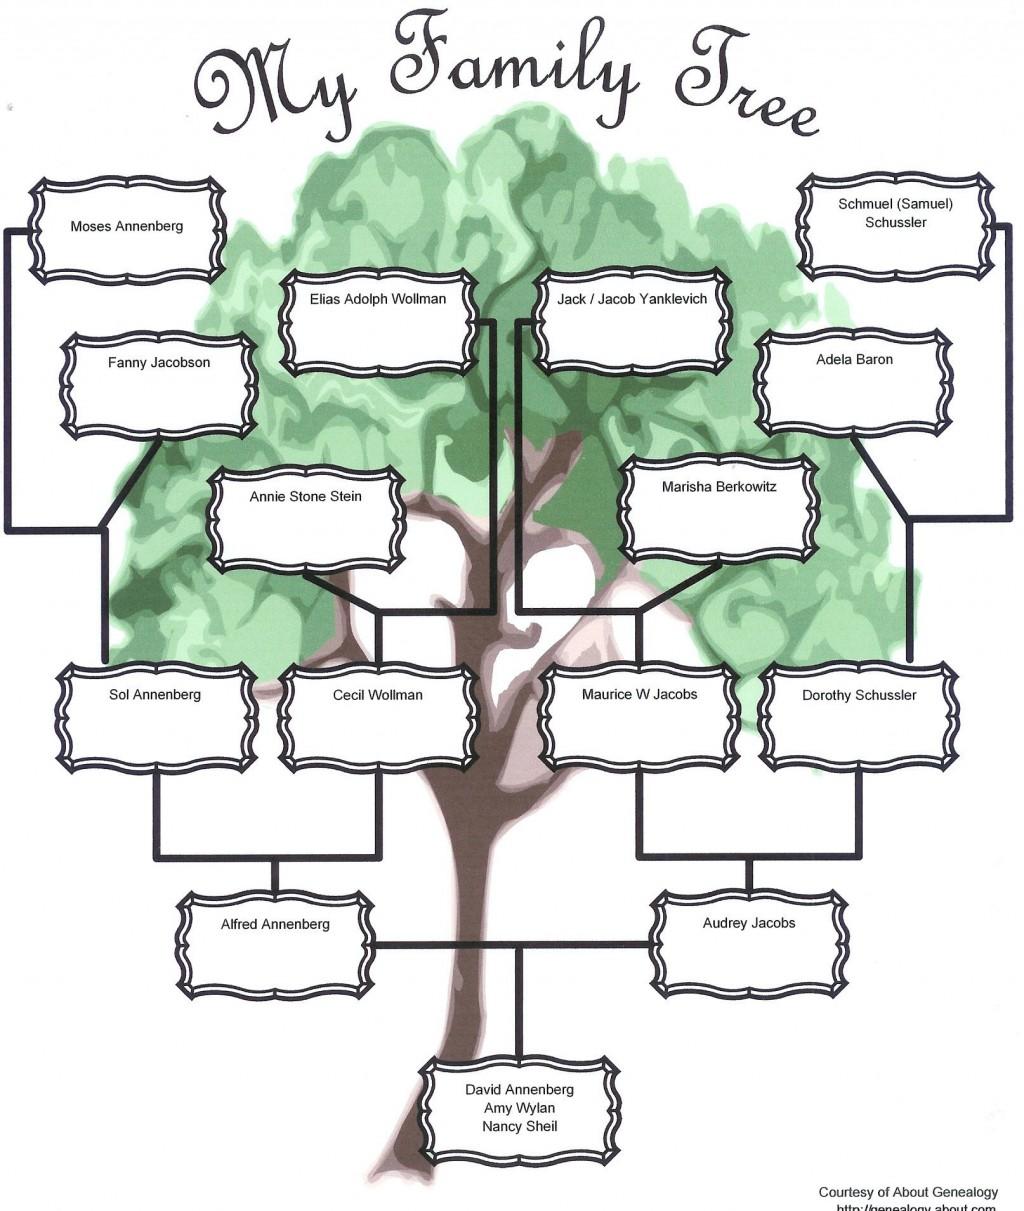 005 Impressive Editable Family Tree Template Online Free Design Large